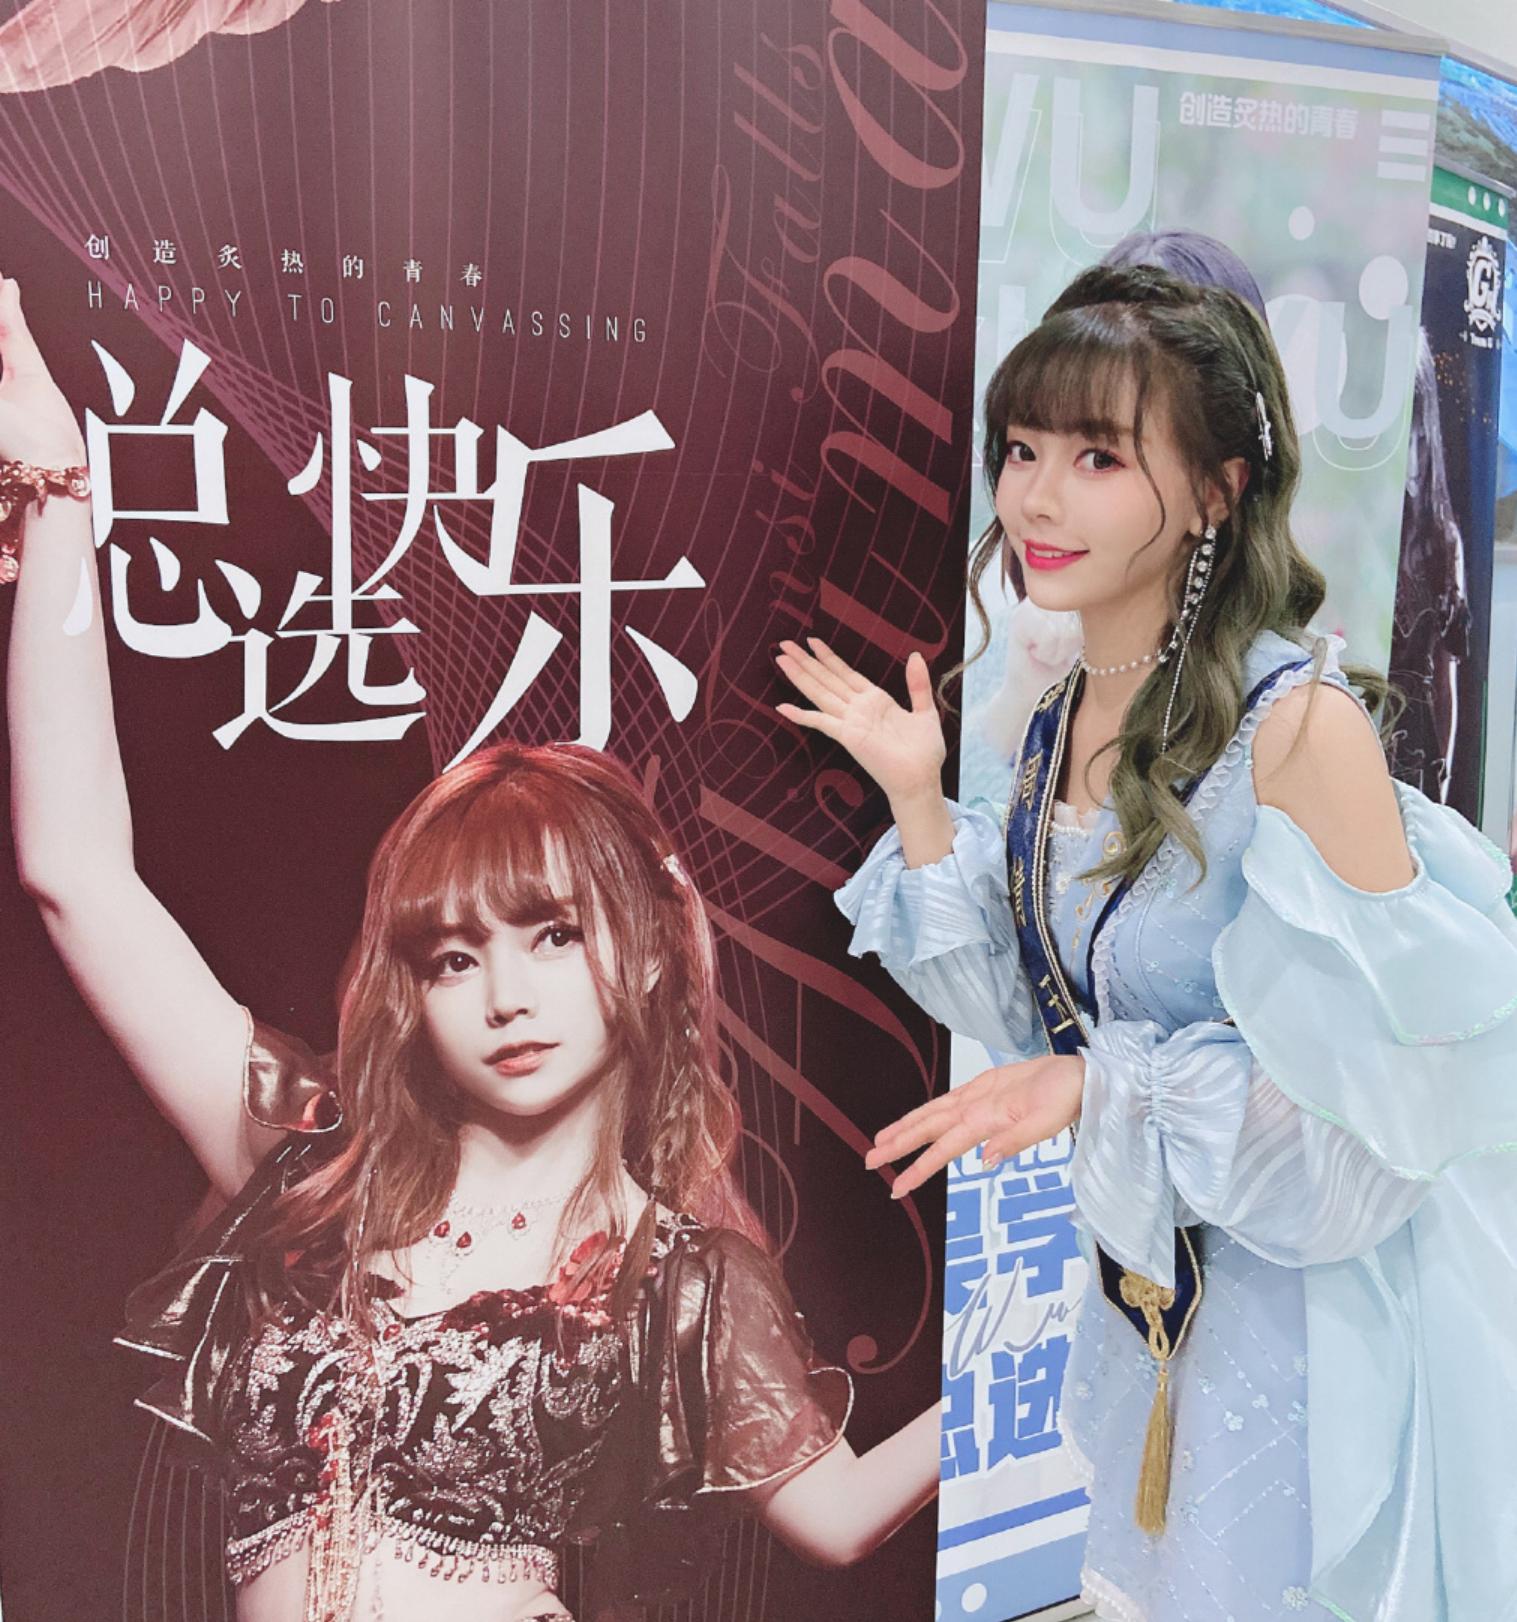 SNH48全新组合AW9浪彩少女   谈一谈该组合的可能性